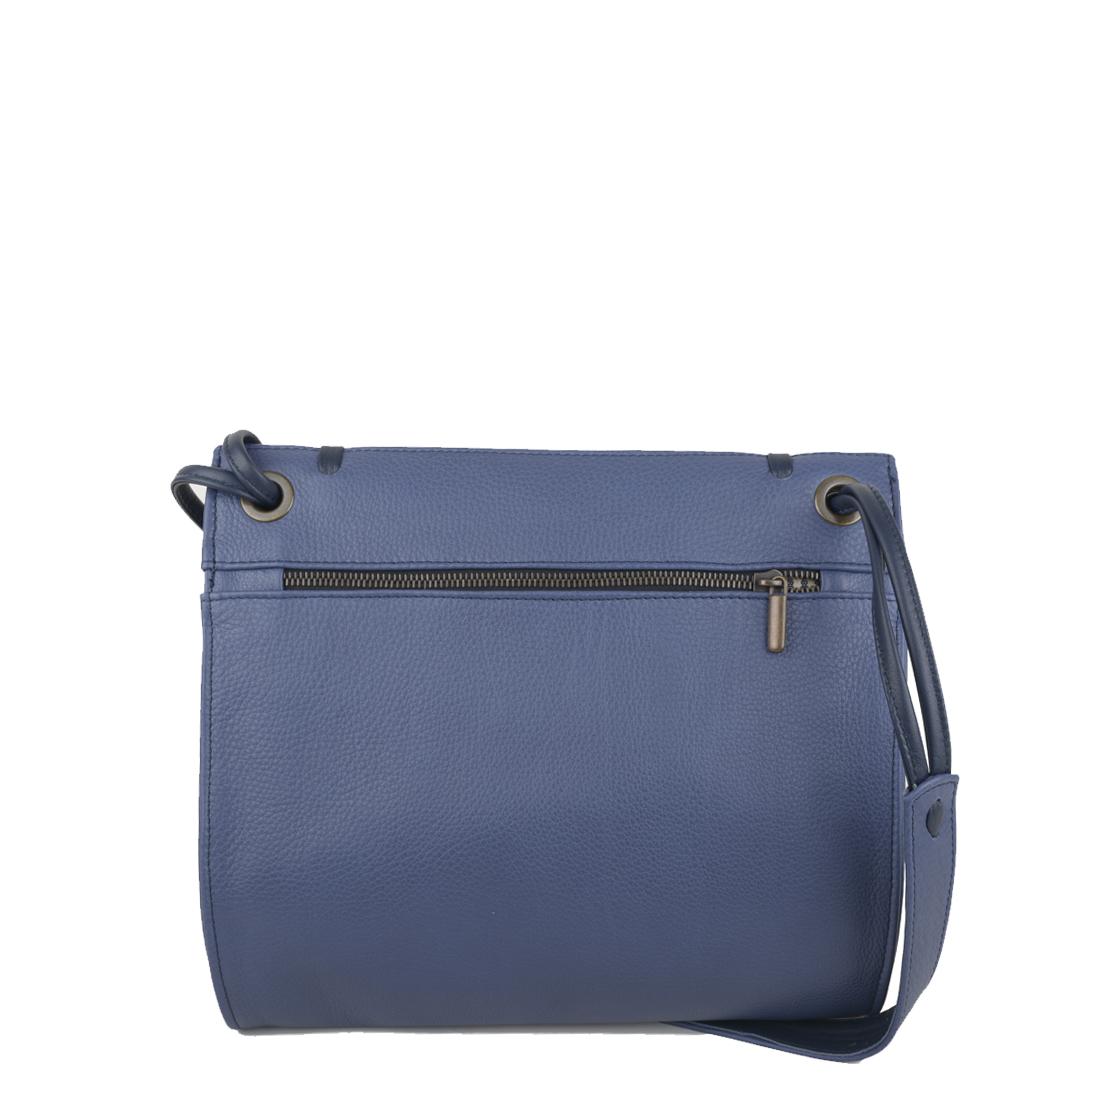 Elsa Chalk Blue Leather Across Body Bag